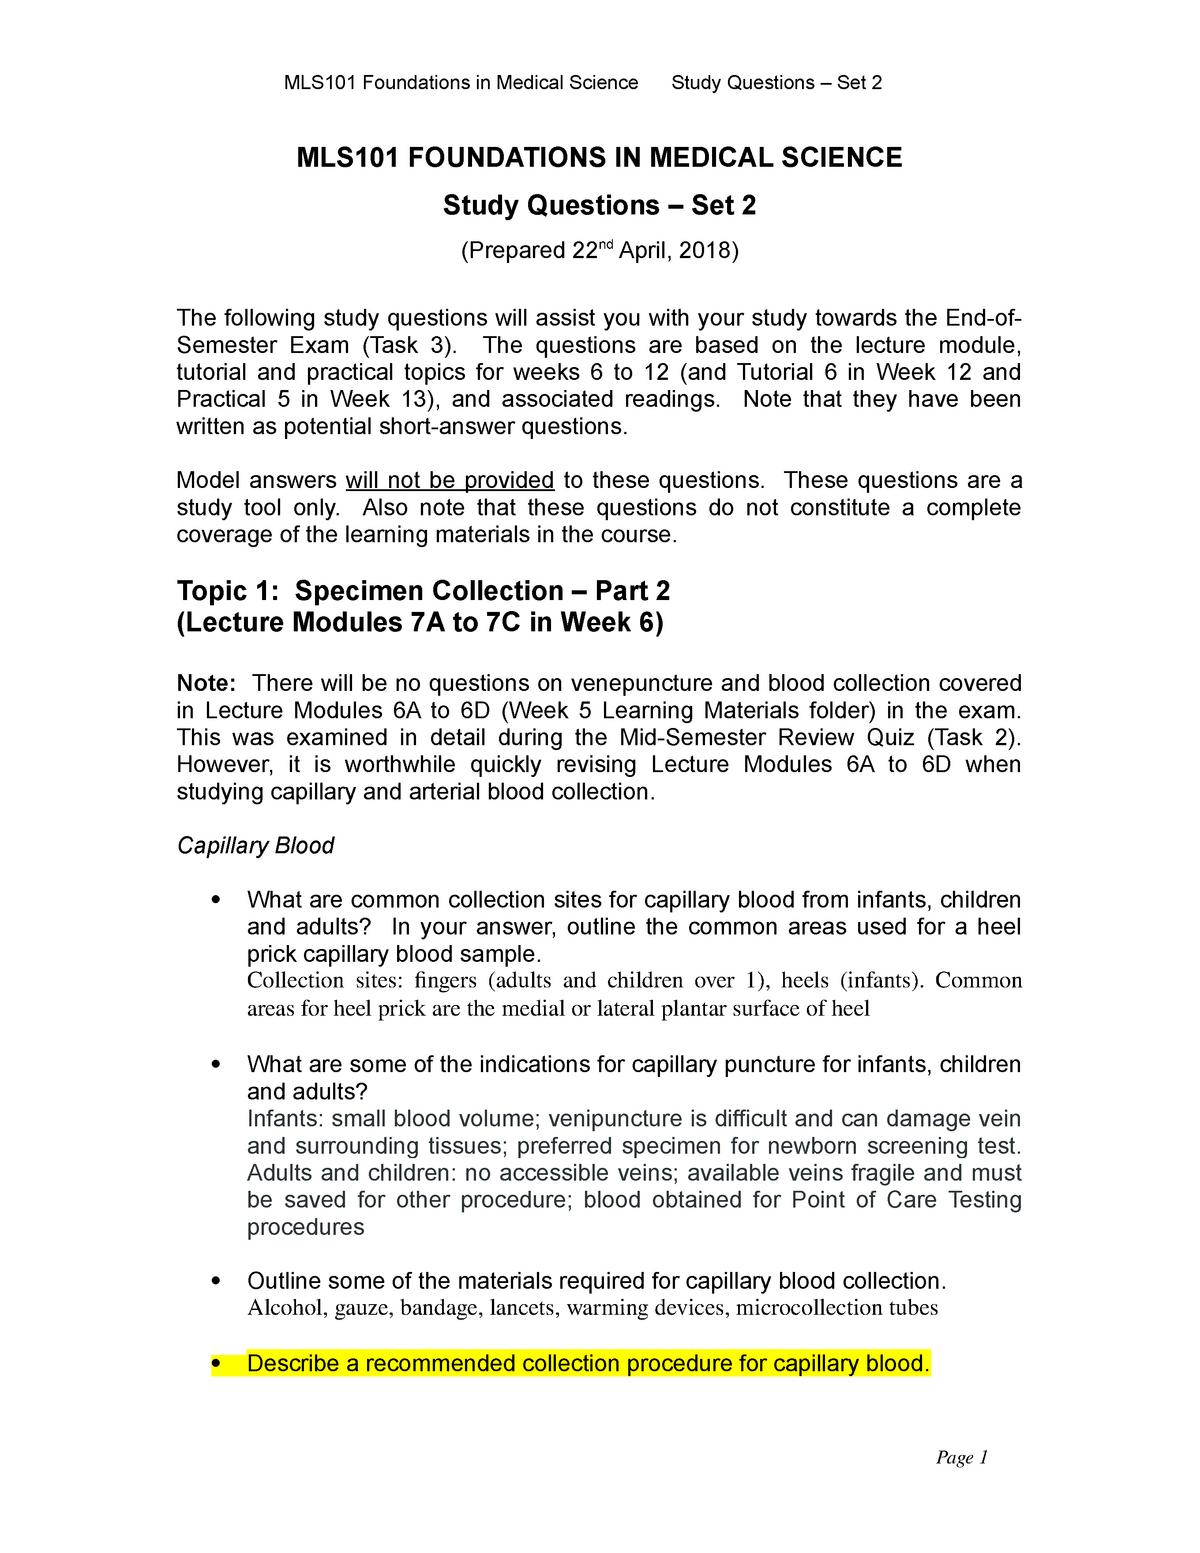 Exam 2018 - MLS101: Introduction to Medical Laboratory Science - StuDocu